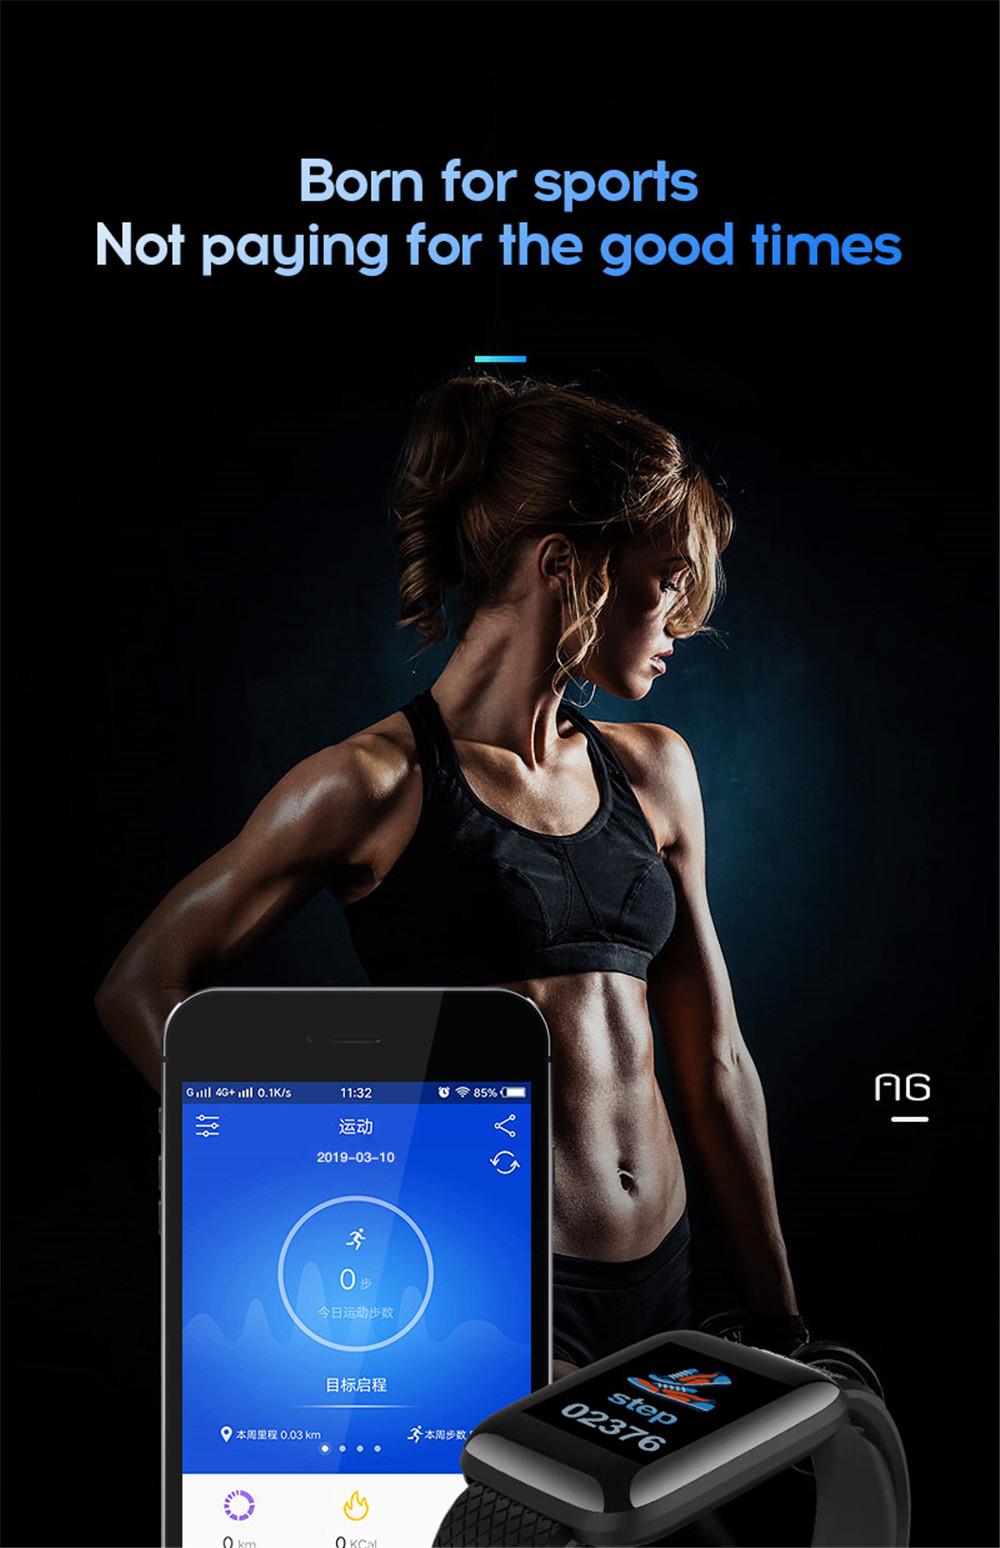 6-130435- Smart Watch Men Blood Pressure Waterproof Smartwatch Women Heart Rate Monitor Fitness Tracker Watch GPS Sport For Android IOS